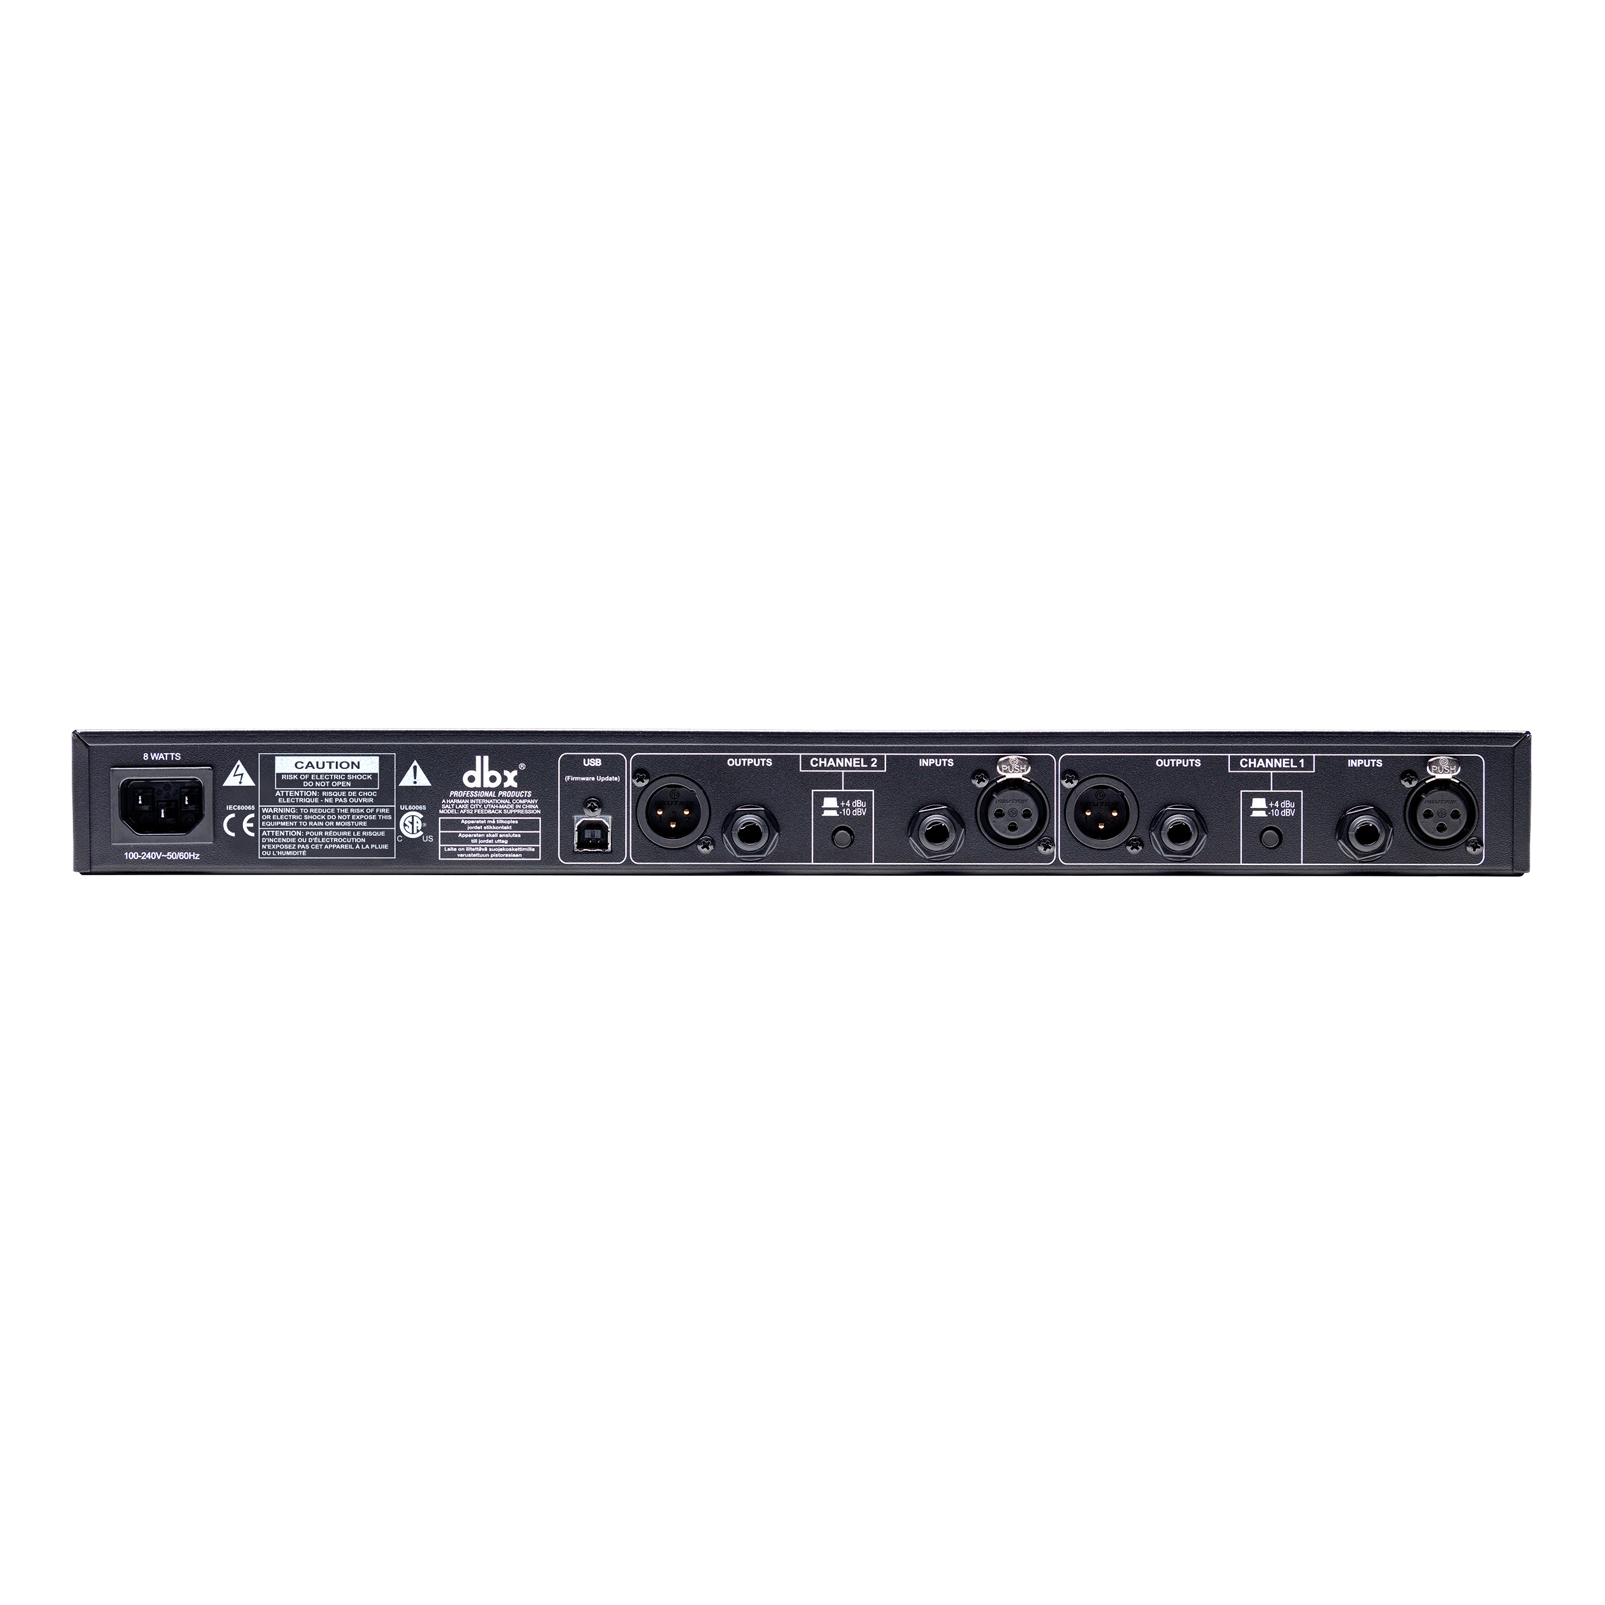 AFS2 - Black - Advanced Feedback Suppression® Processor with Full LCD Display - Back